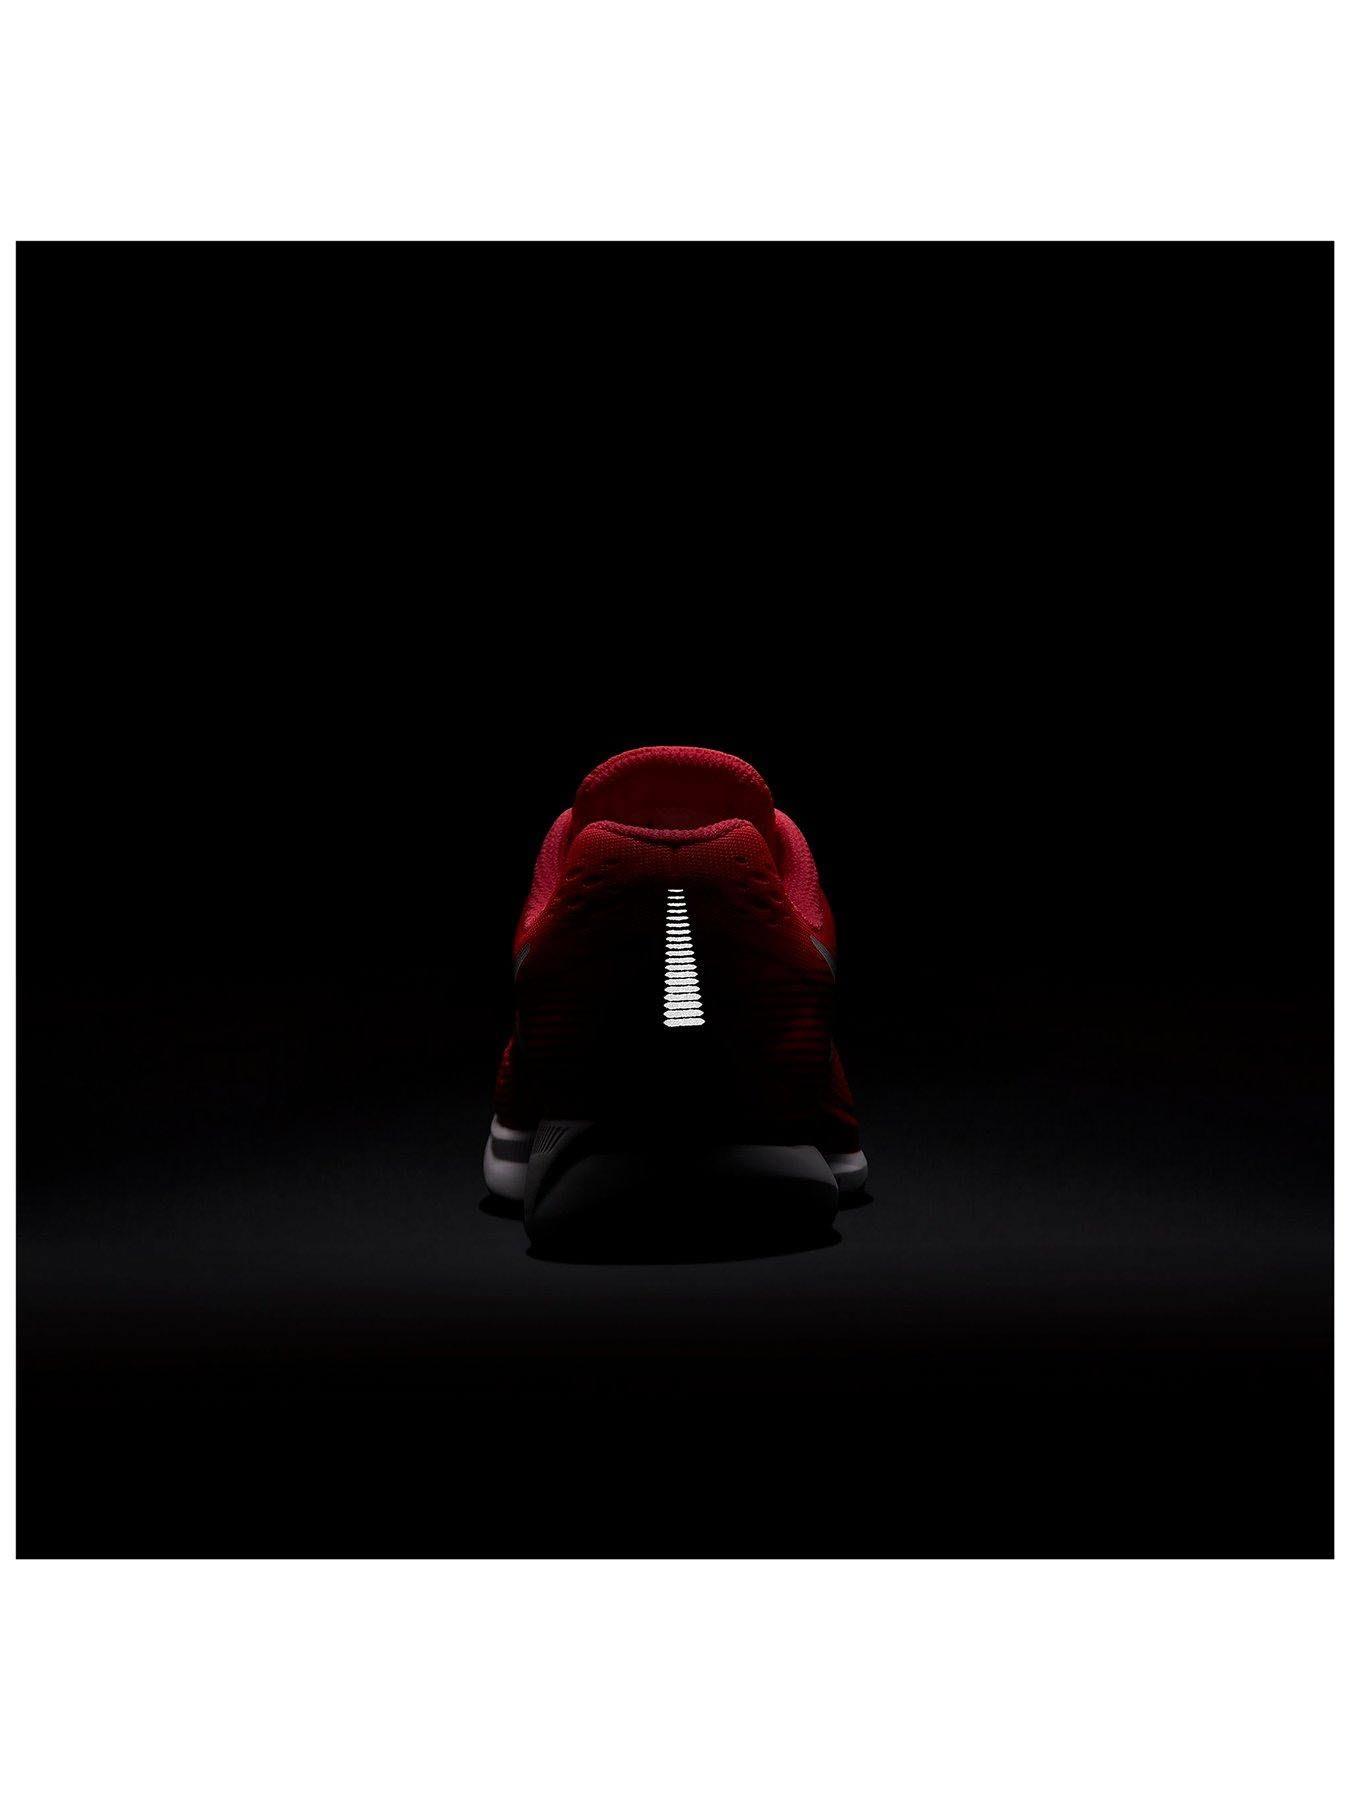 Air 34 Pegasus Wmns rood Concurrentie Nike Zoom hardloopschoenen jAR45L